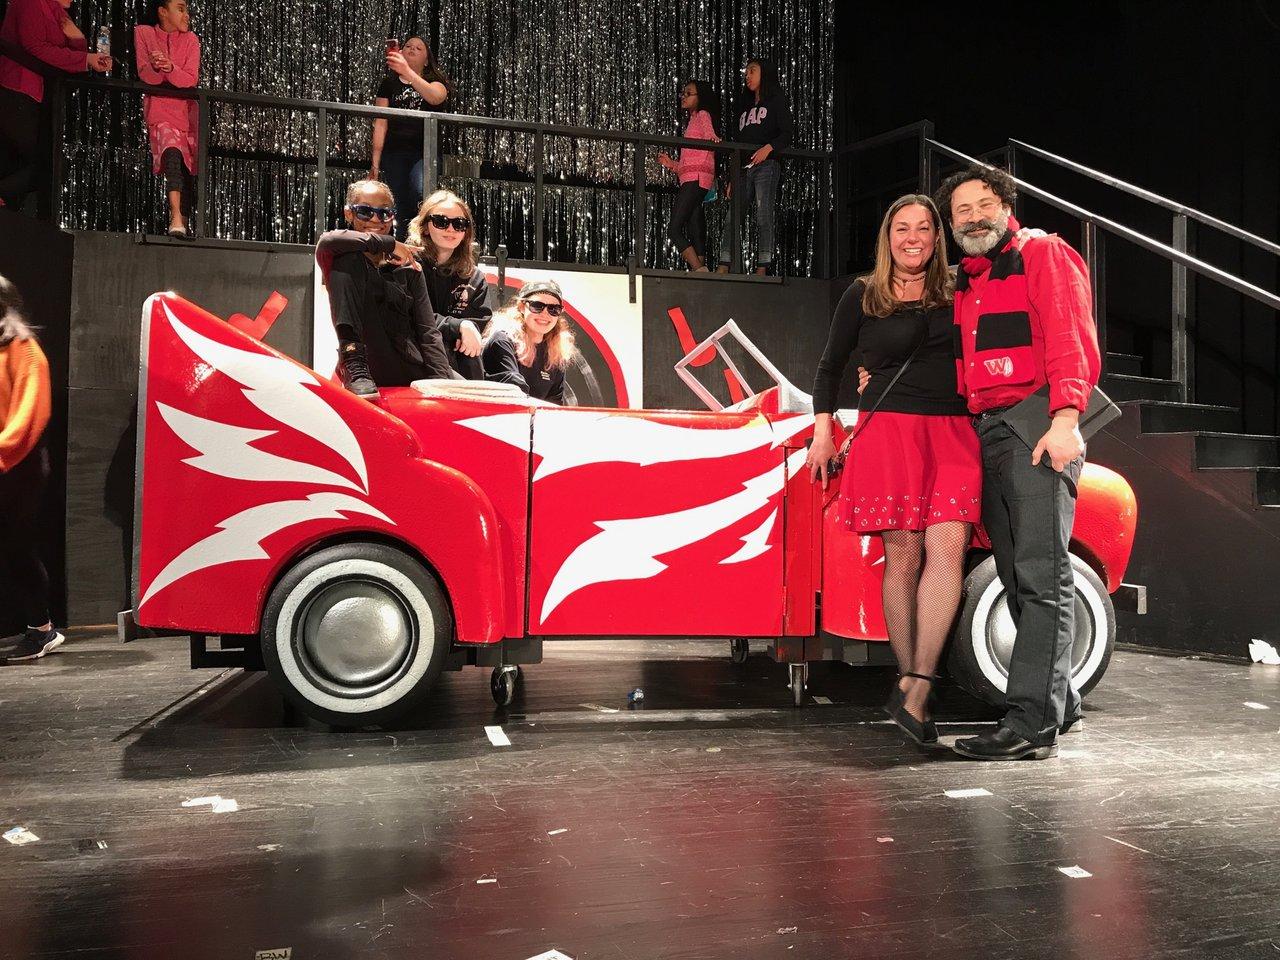 Grease Musical- Grease Car photo 49B39DB4-B832-49D9-8EBC-4EE56C058975.jpg